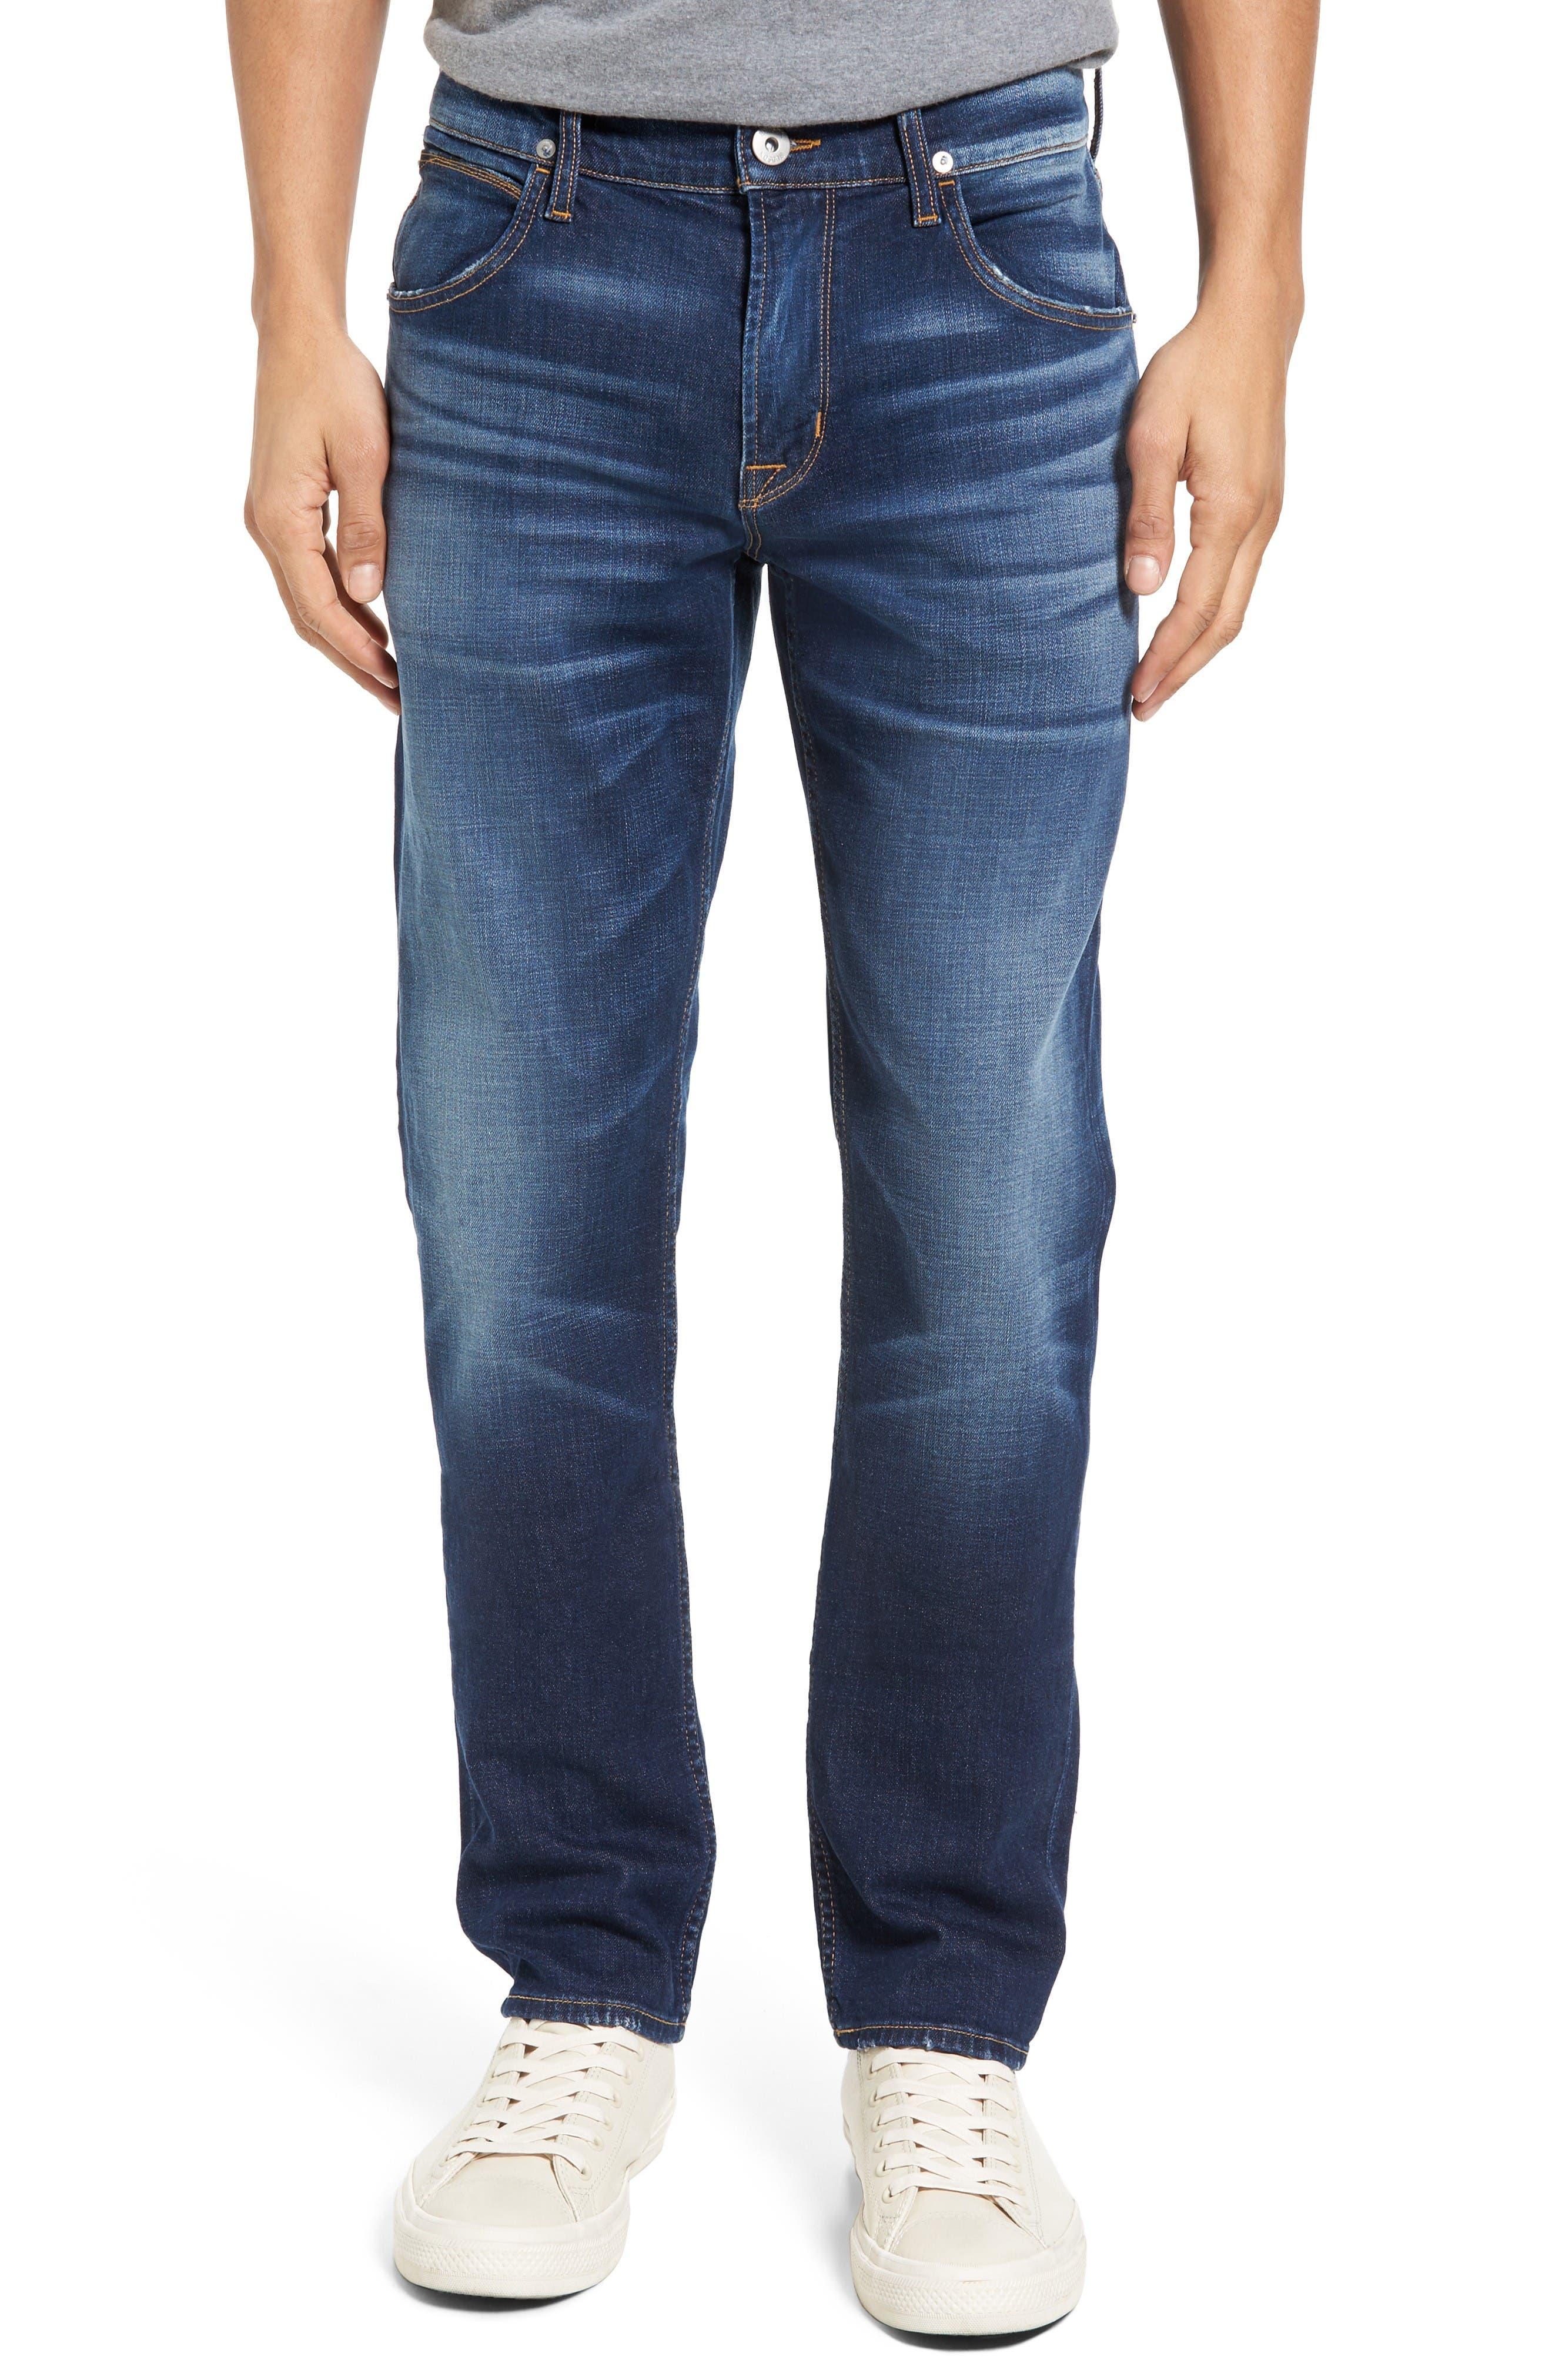 Hudson Jeans Blake Slim Fit Jeans (Genuine)